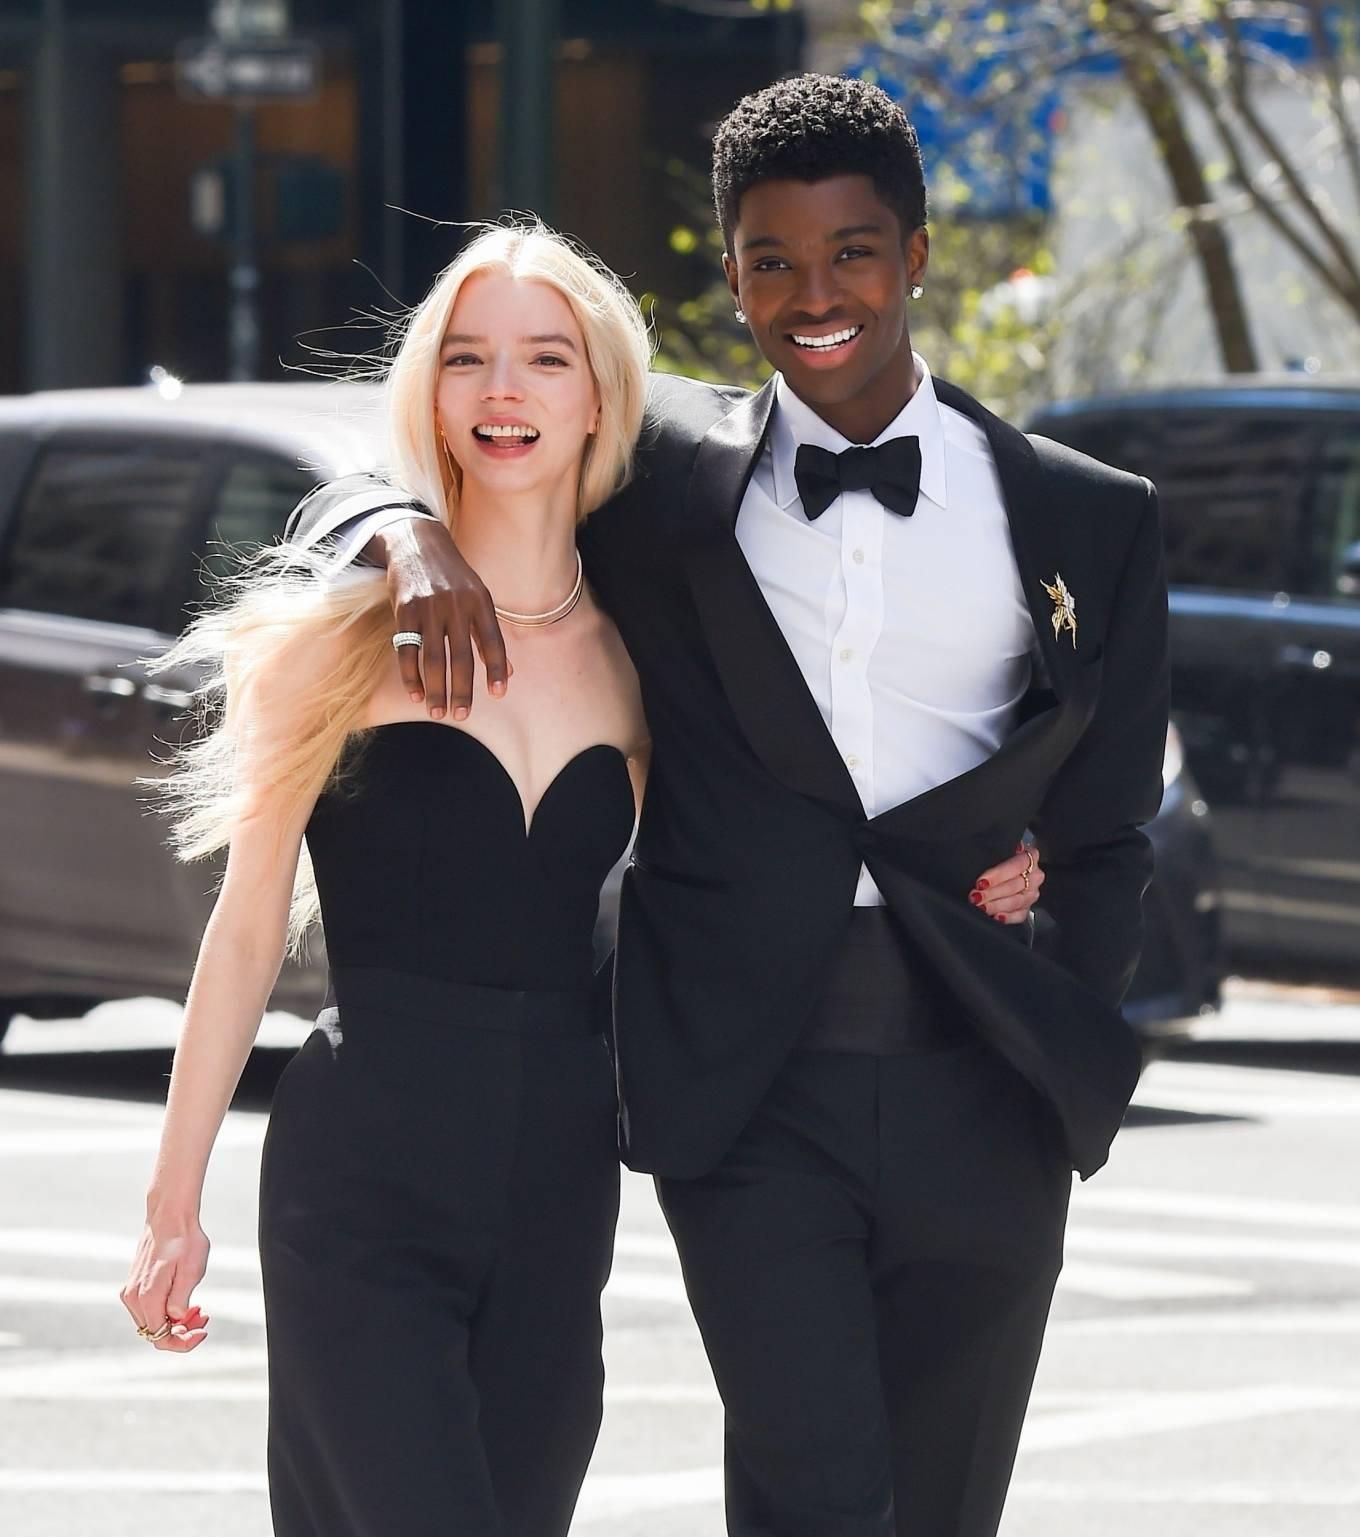 Anya Taylor-Joy 2021 : Anya Taylor-Joy – Shooting advert for Tiffany and Co in New York-10